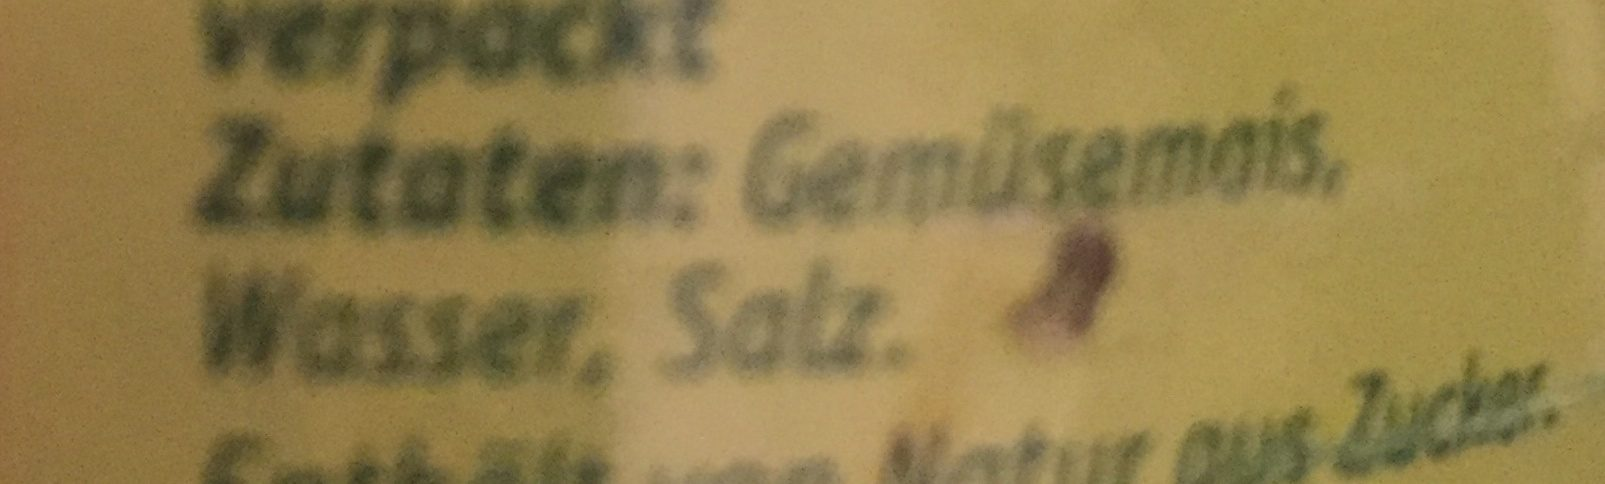 Goldmais - Inhaltsstoffe